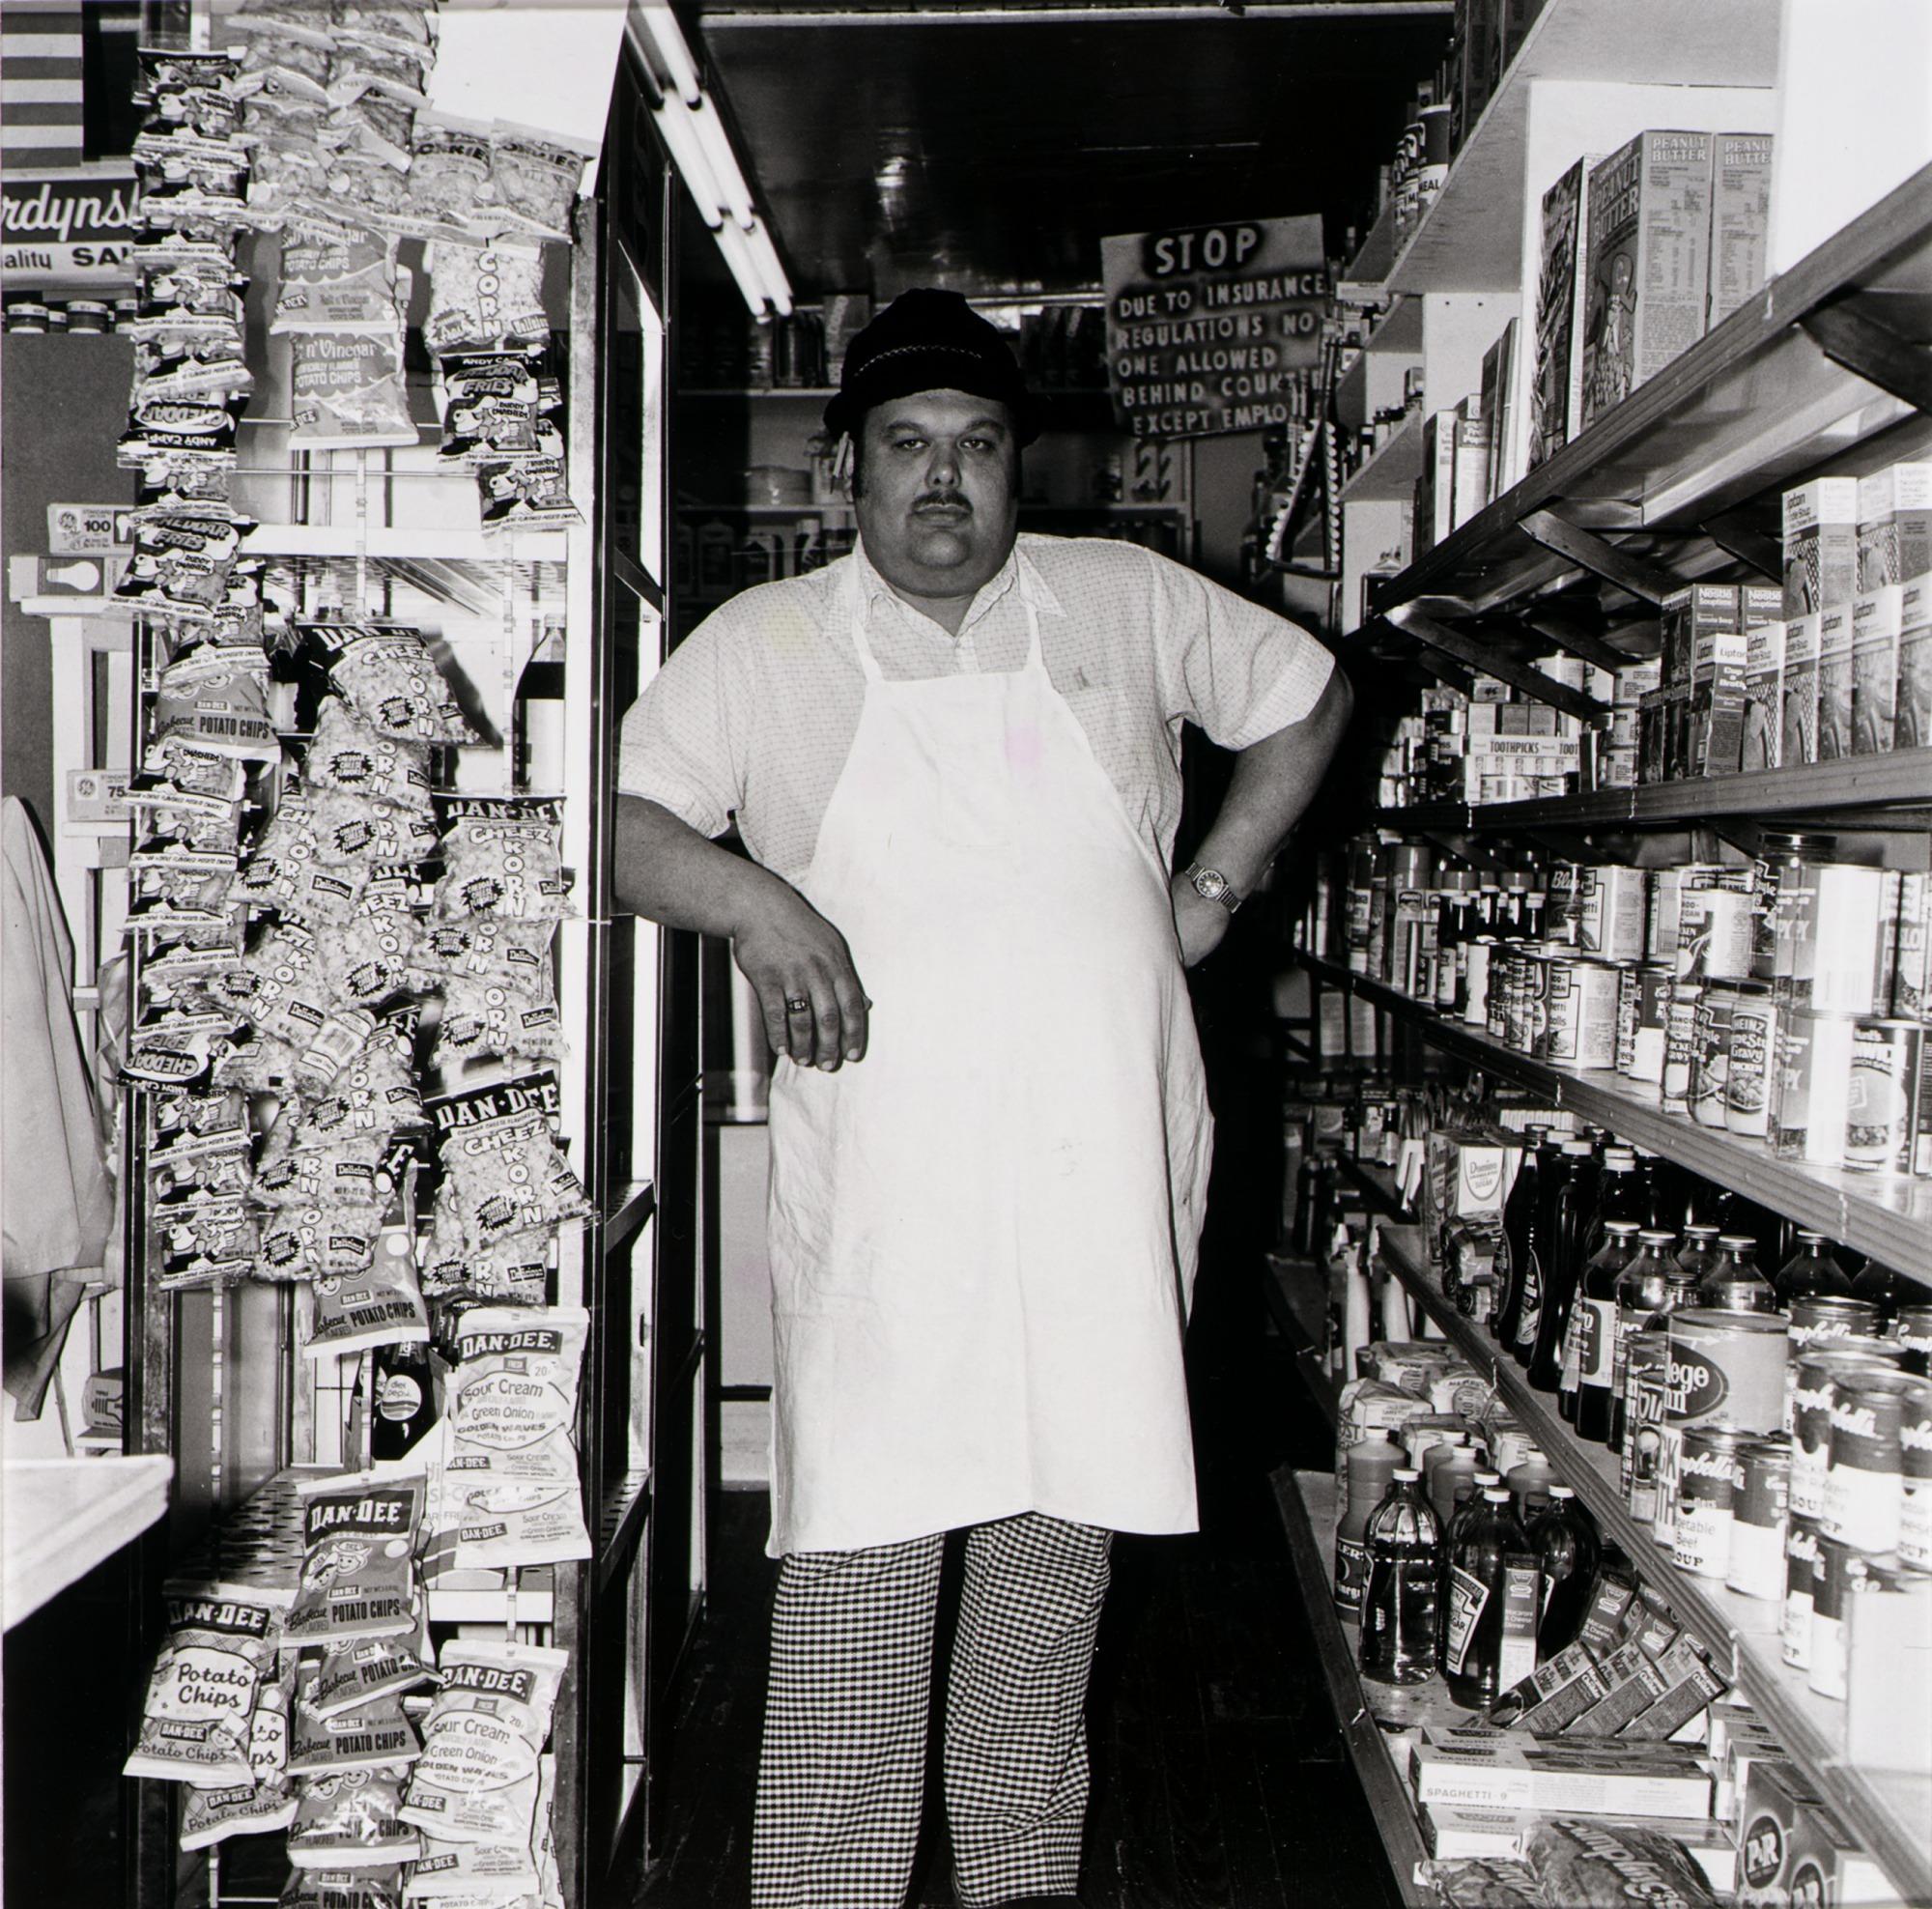 Lovejoy, from Portrait of Buffalo (Buffalo, New York Documentary Survey Project)